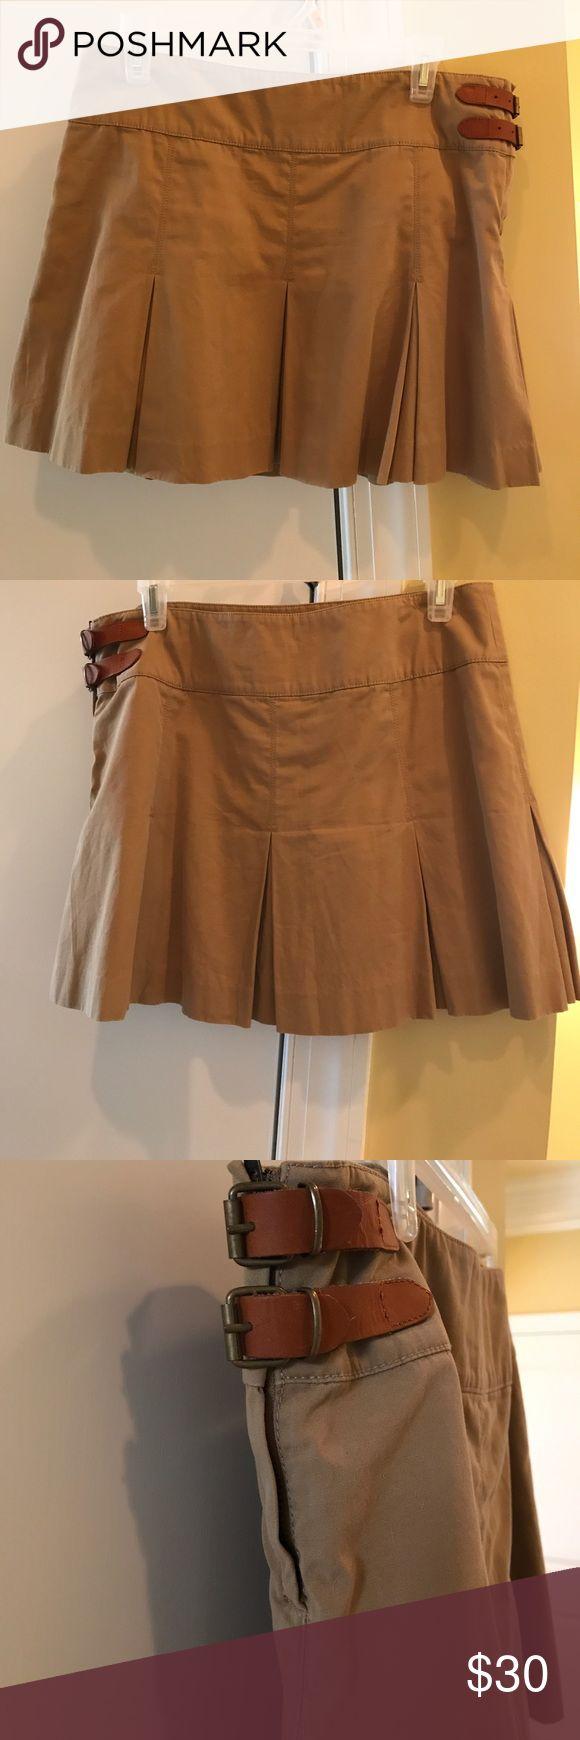 Ralph Lauren pleated khaki skirt Ralph Lauren pleated khaki skirt with buckles at the hip. 15 inches in length Ralph Lauren Skirts Mini